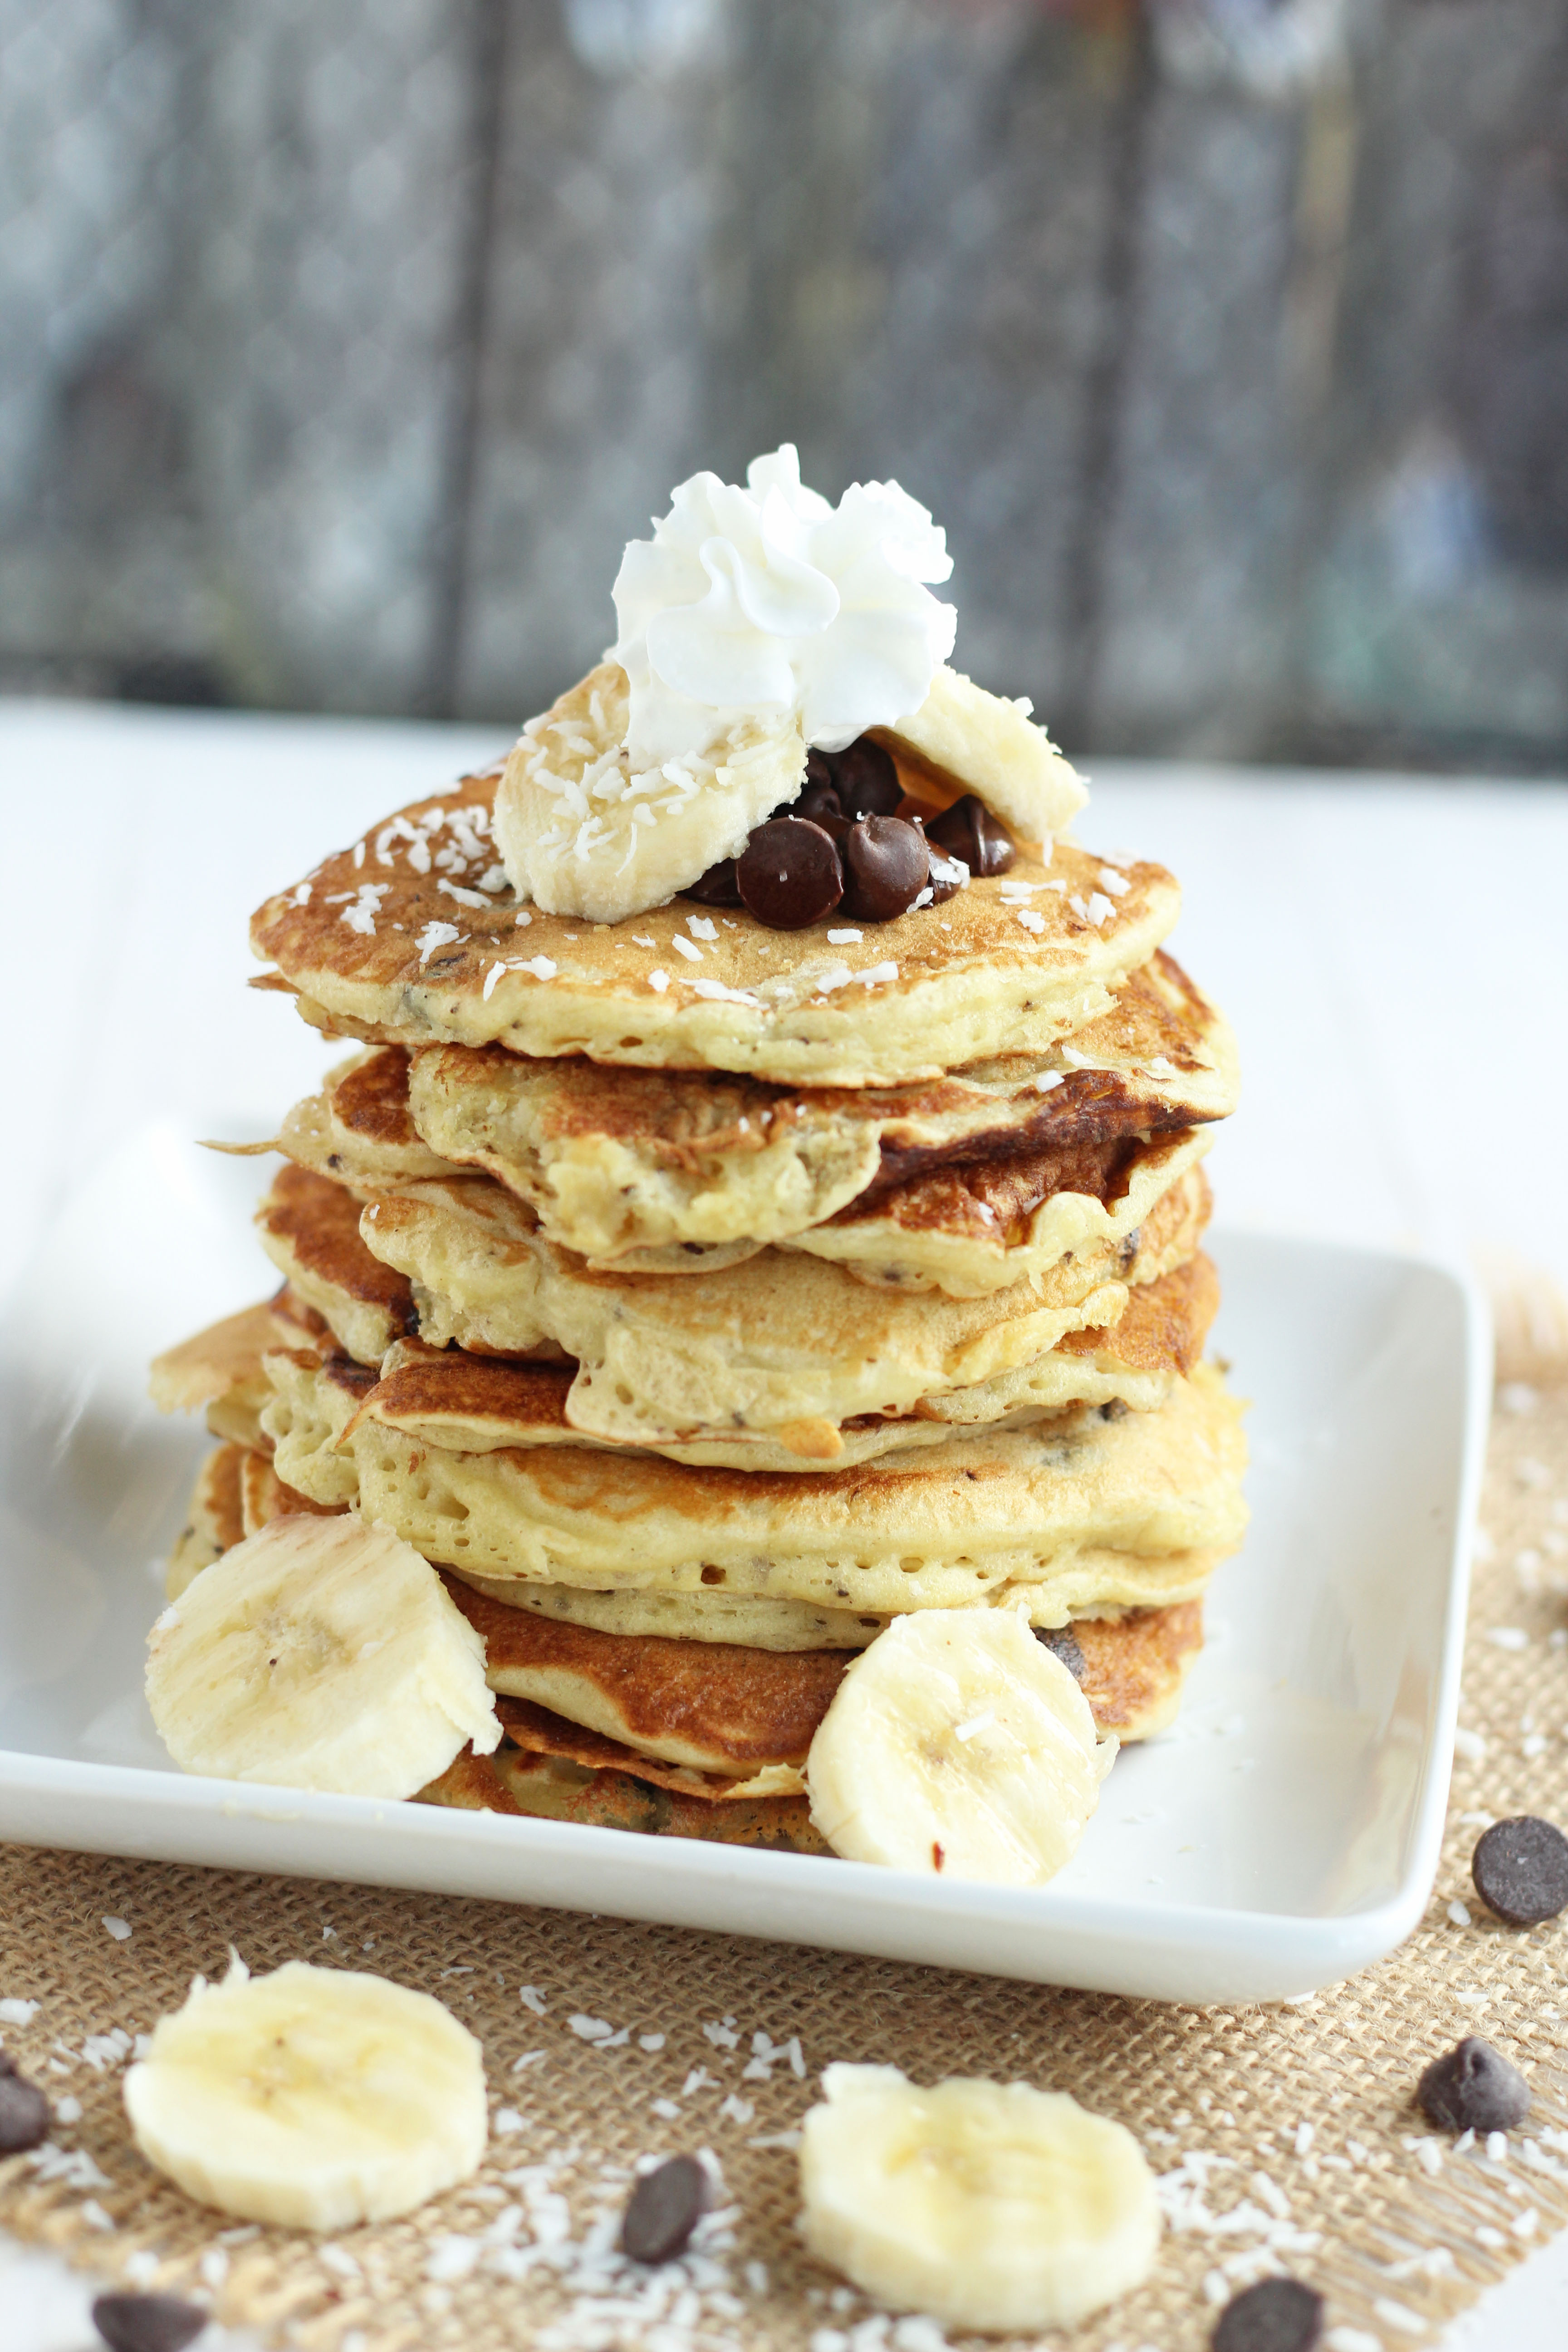 Banana Coconut Chocolate Chip Pancakes